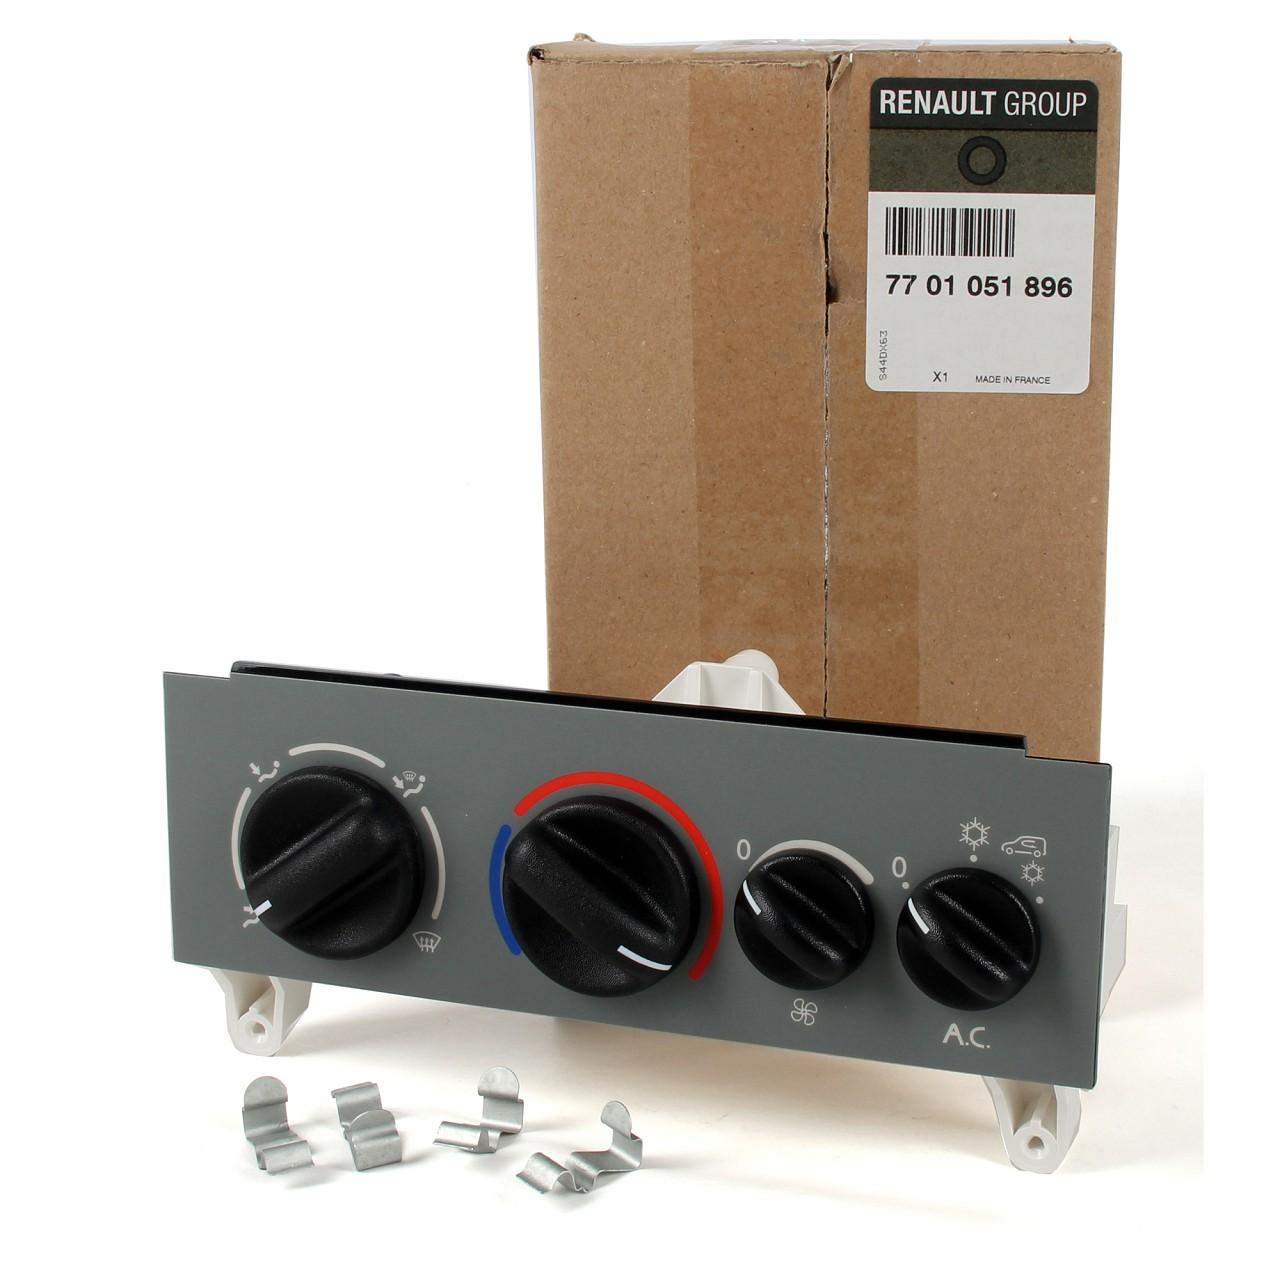 ORIGINAL Renault Bedienelement Klimaanlage 7701051896 für KANGOO / KANGOO Rapid